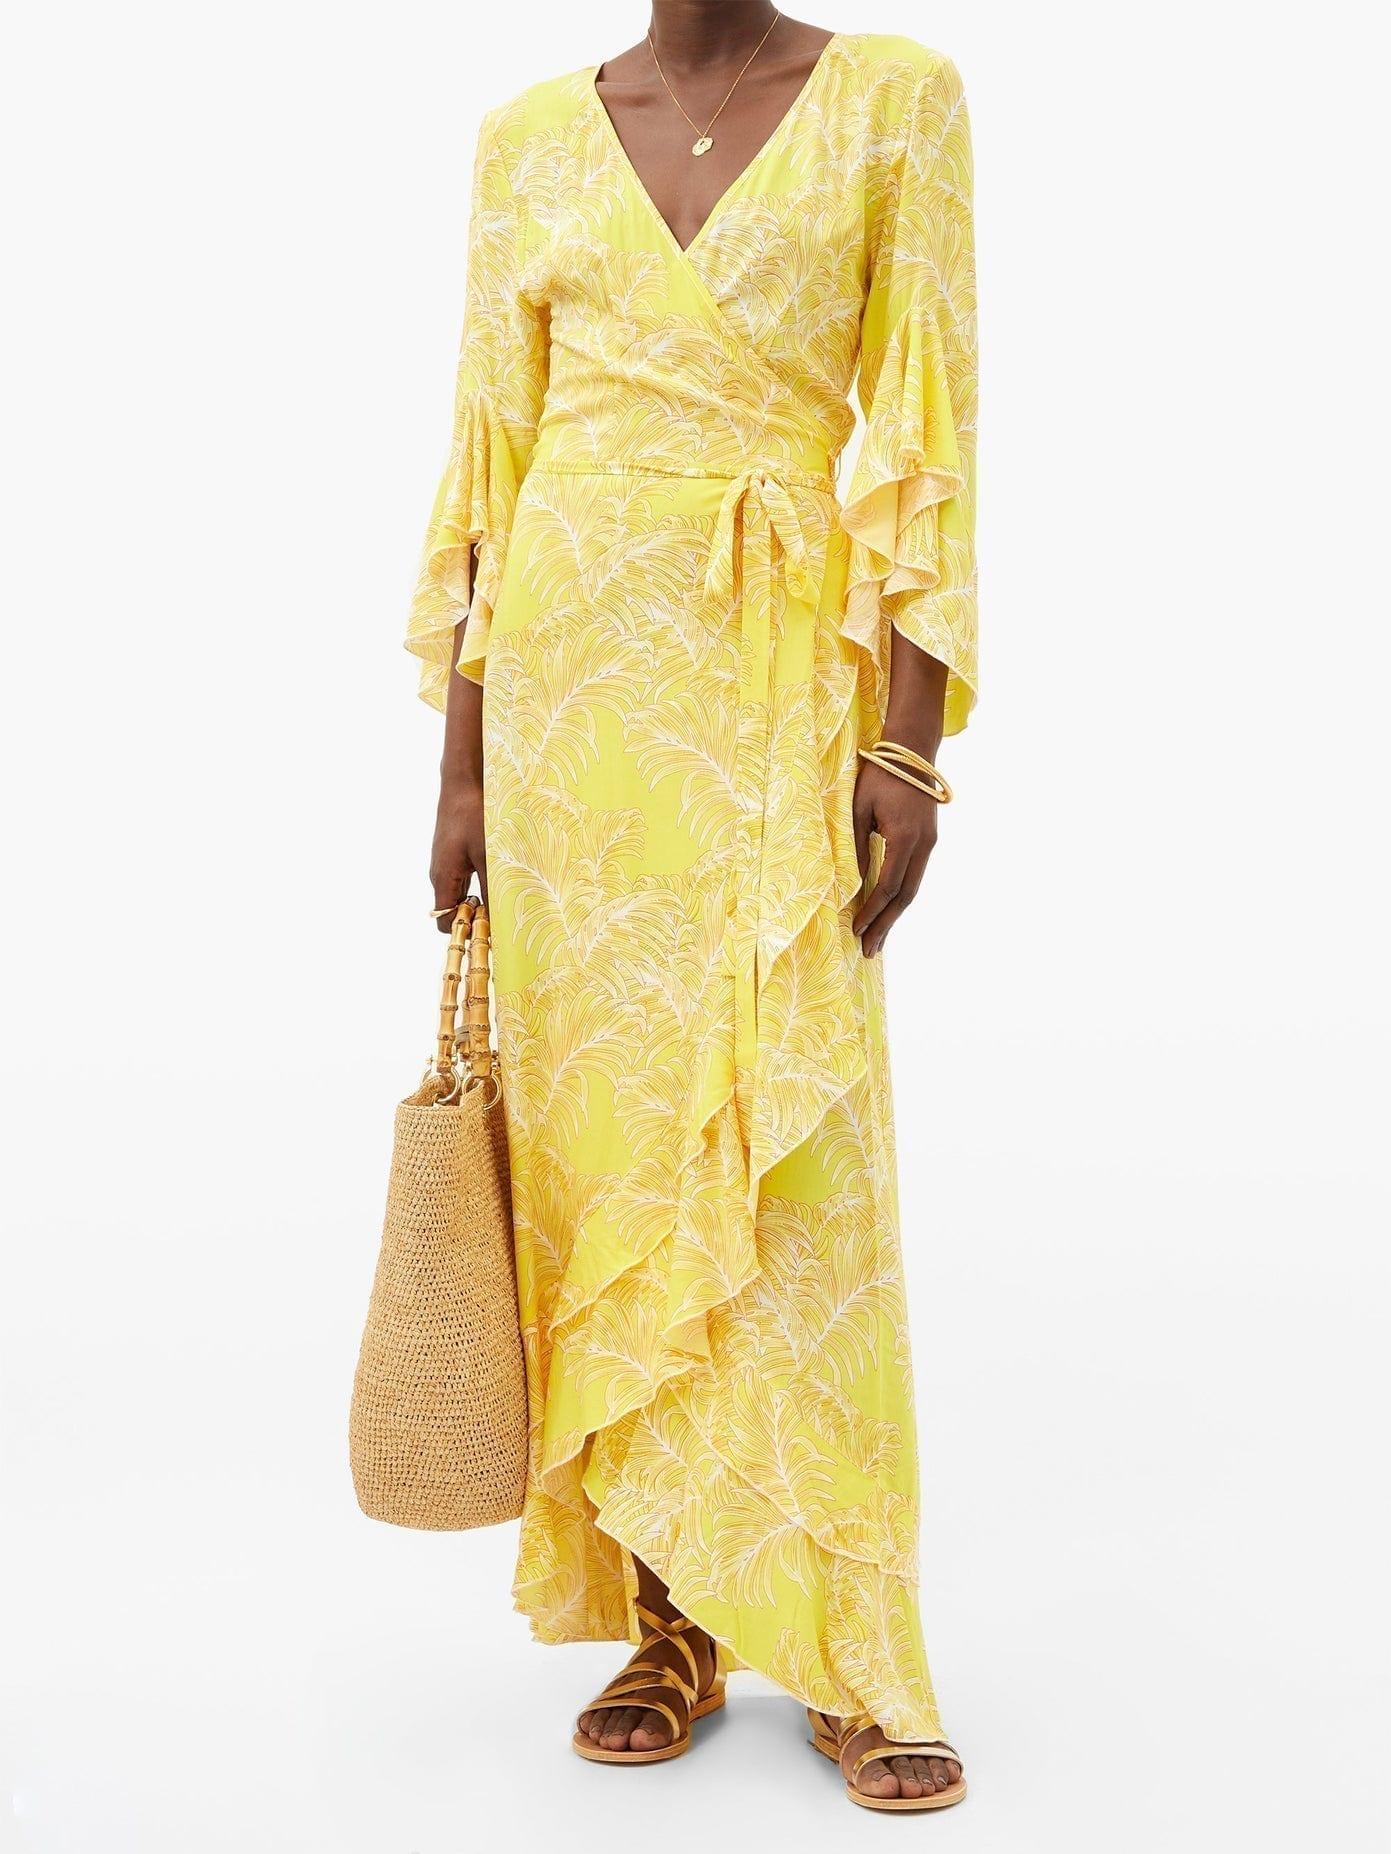 MELISSA ODABASH Cheryl Ruffled Leaf-Print Maxi Wrap Dress